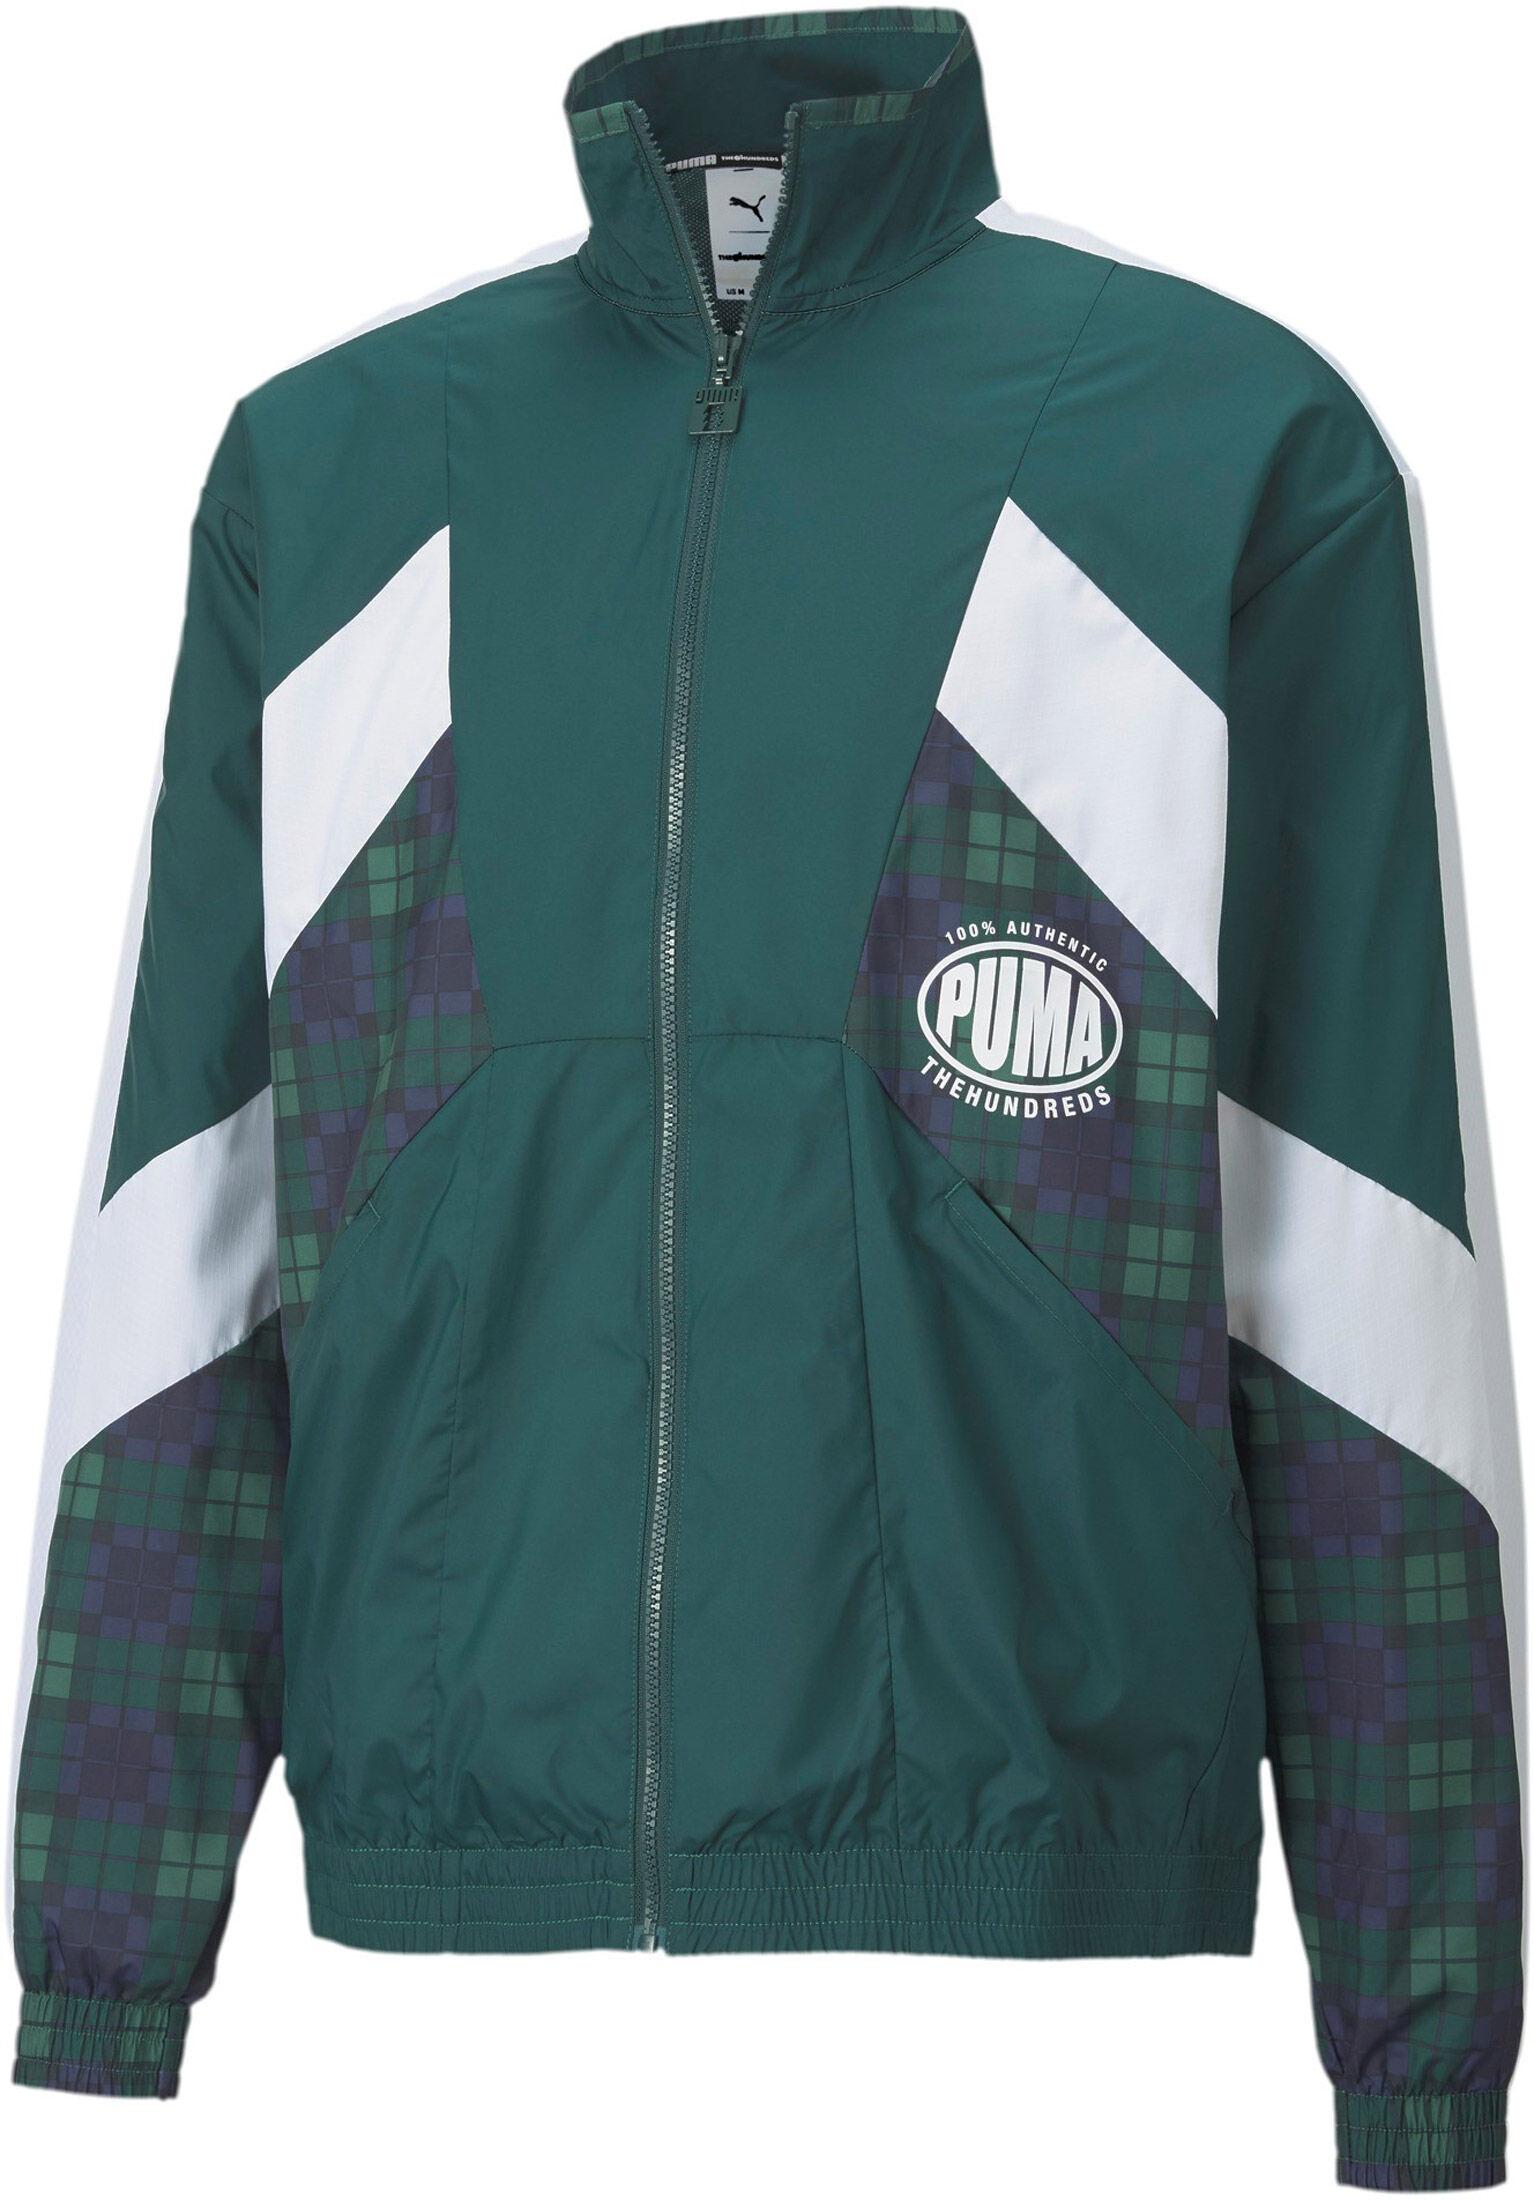 Puma The Hundreds x, taille XL, homme, vert